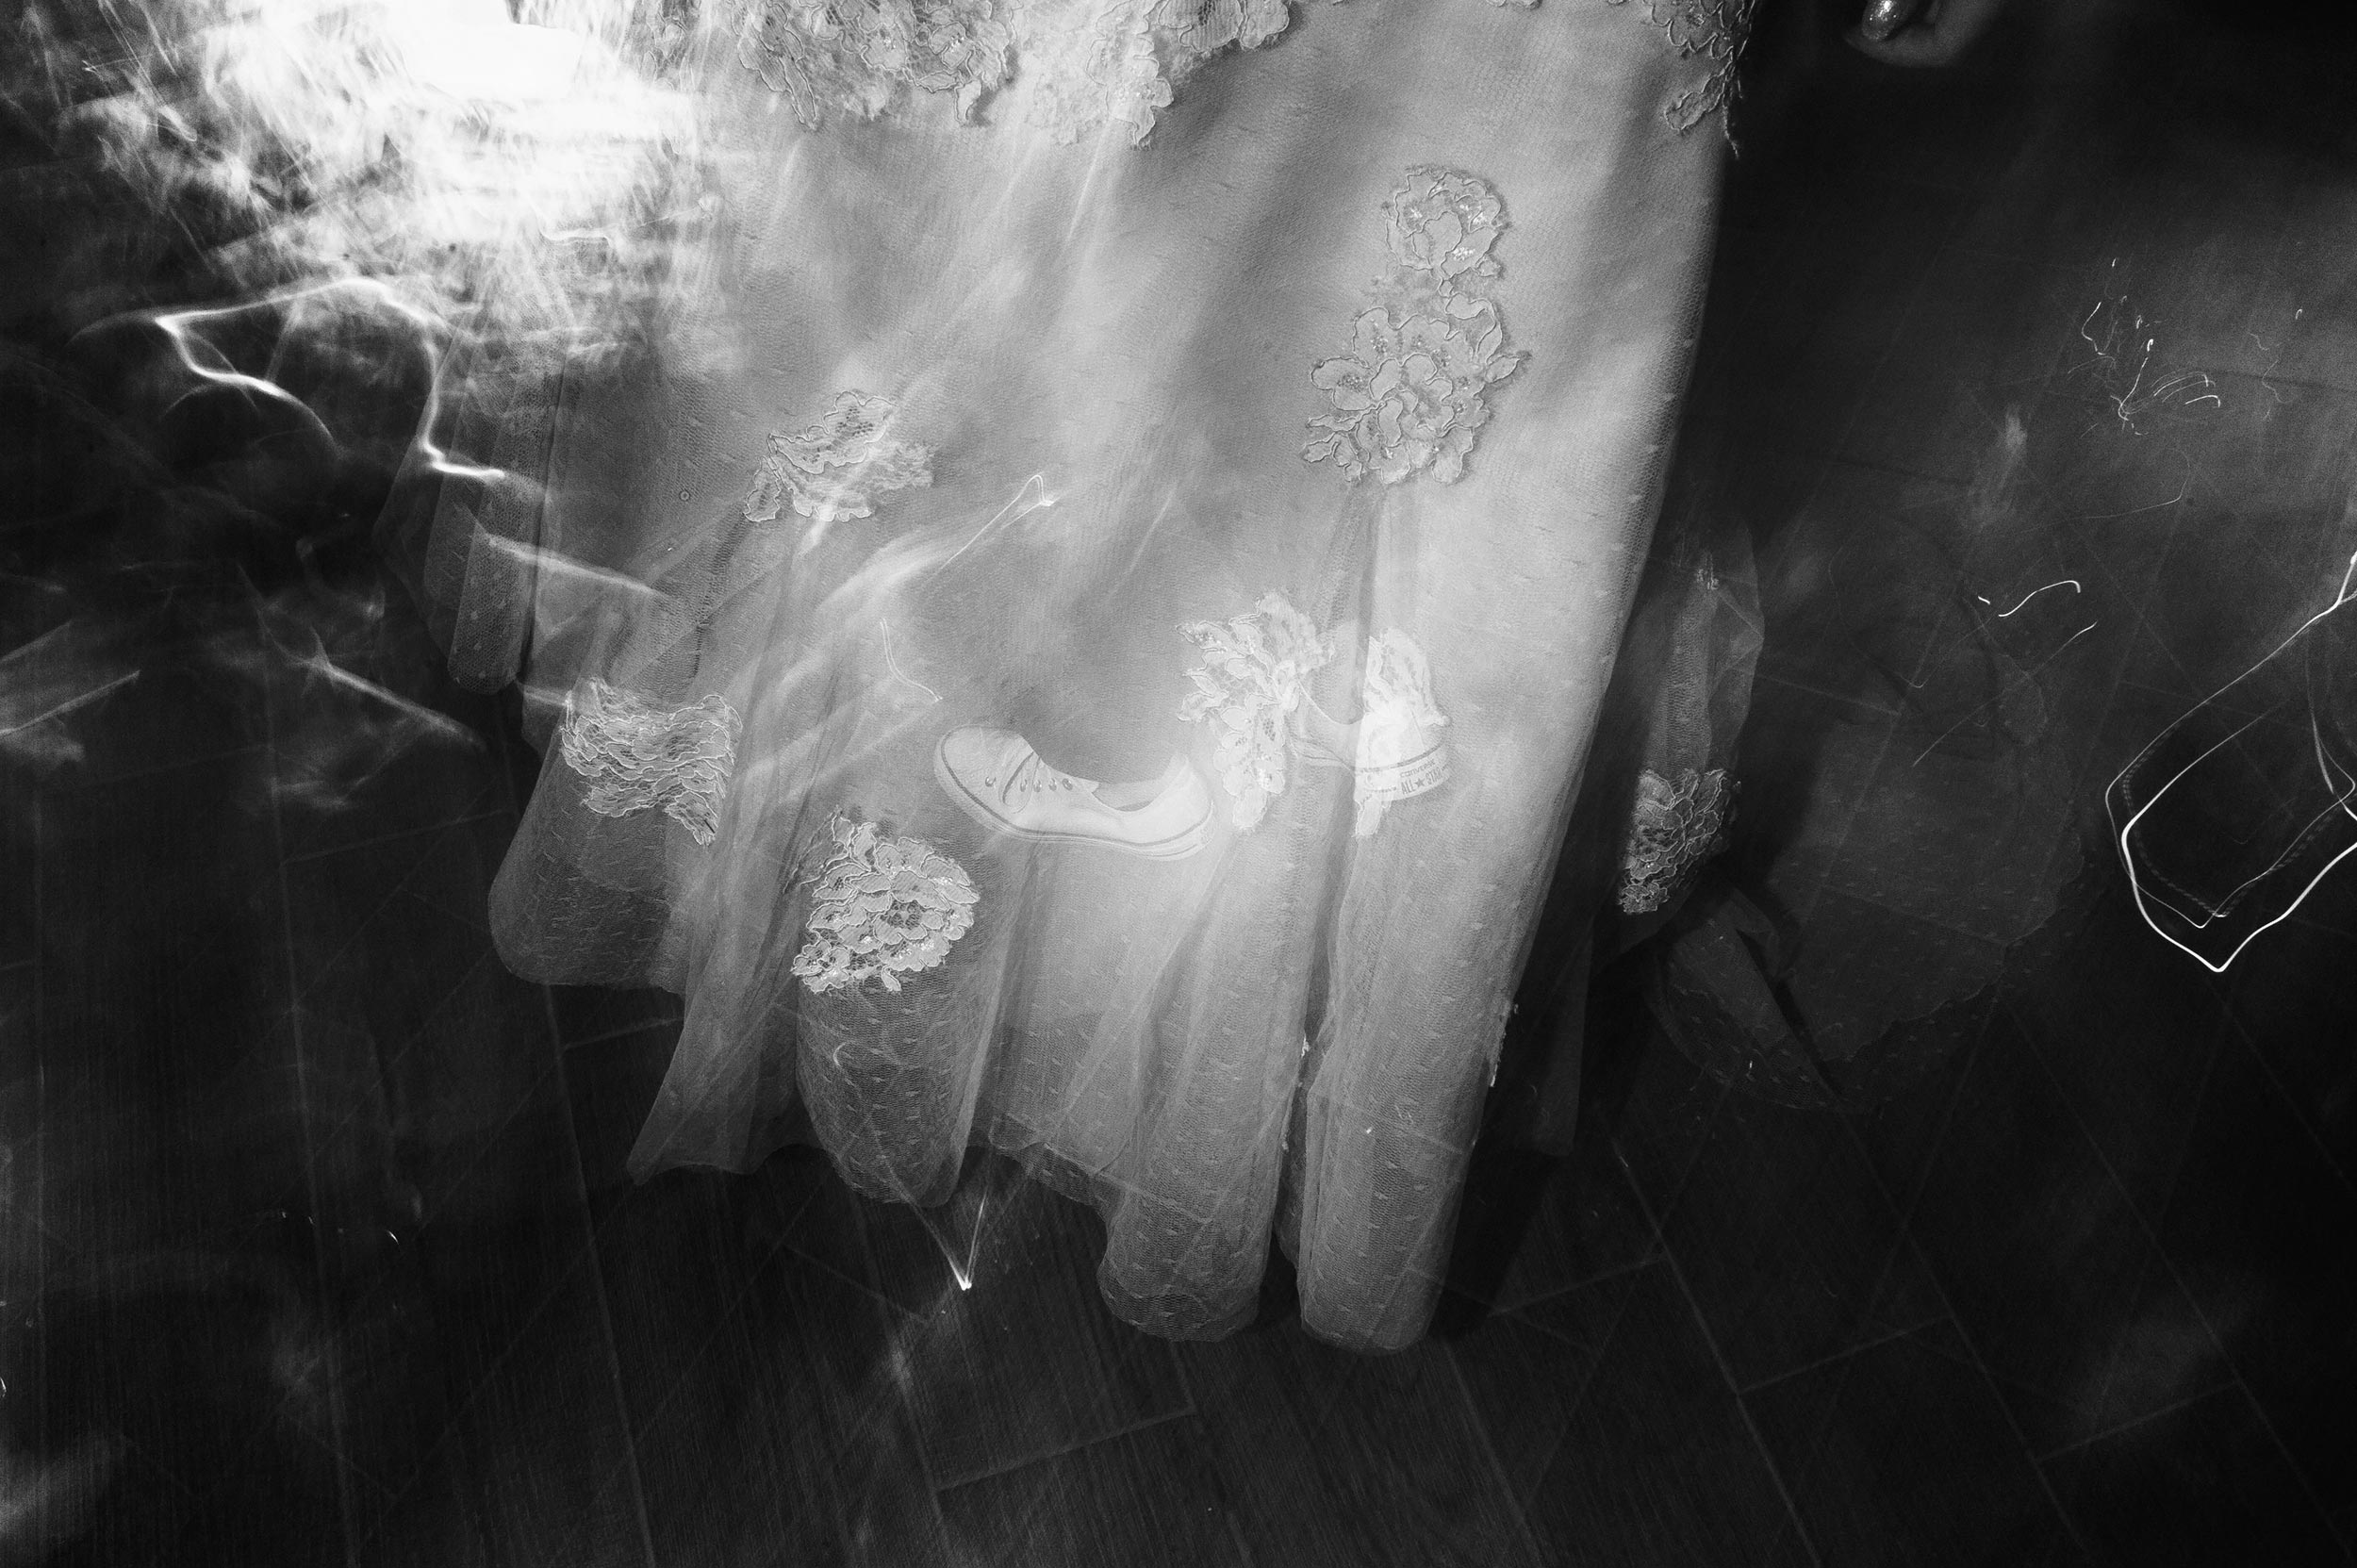 2016-Claudio-Teresa-Naples-Wedding-Photographer-Italy-Alessandro-Avenali-128.jpg